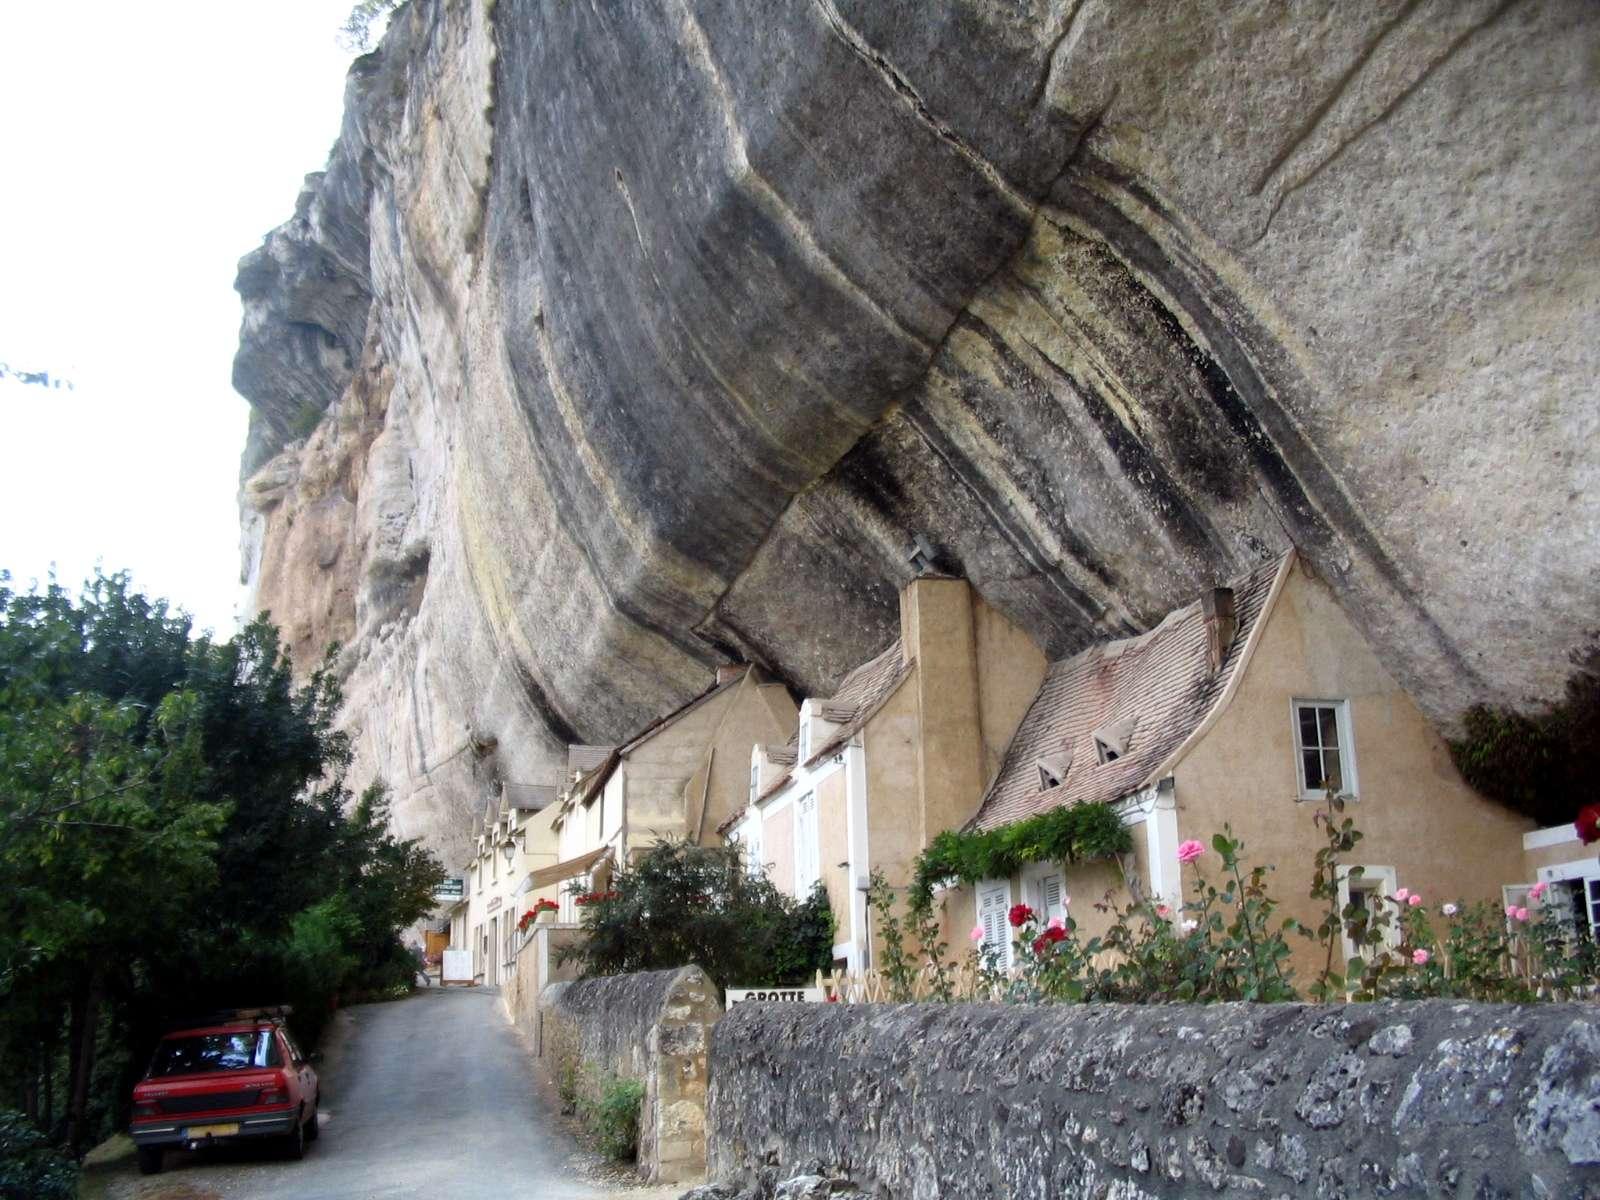 Dordogne - Grotte du grand roc - approaching.jpg